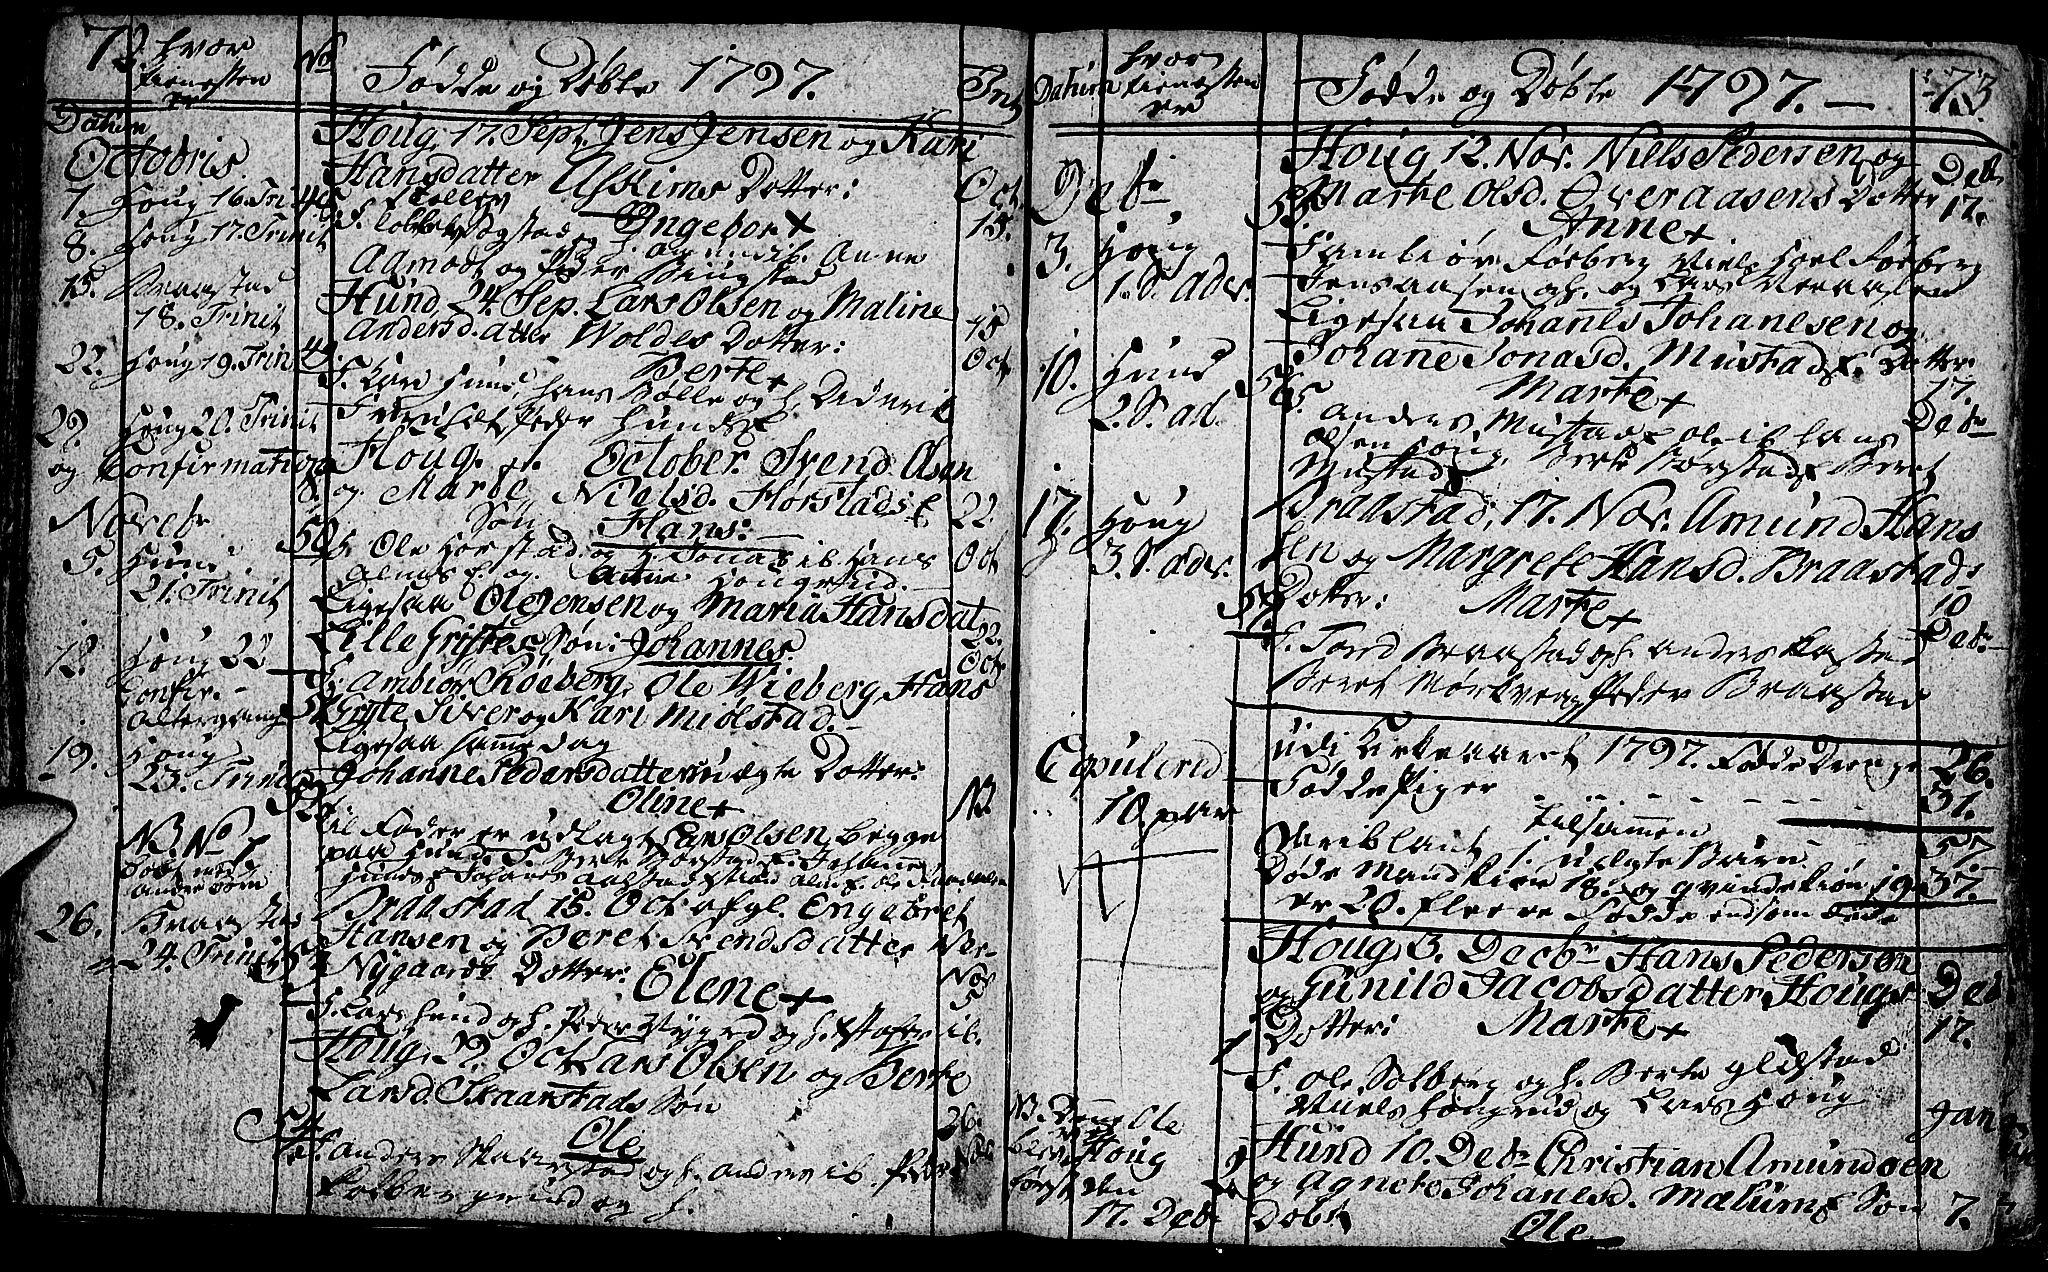 SAH, Vardal prestekontor, H/Ha/Hab/L0002: Klokkerbok nr. 2, 1790-1803, s. 72-73